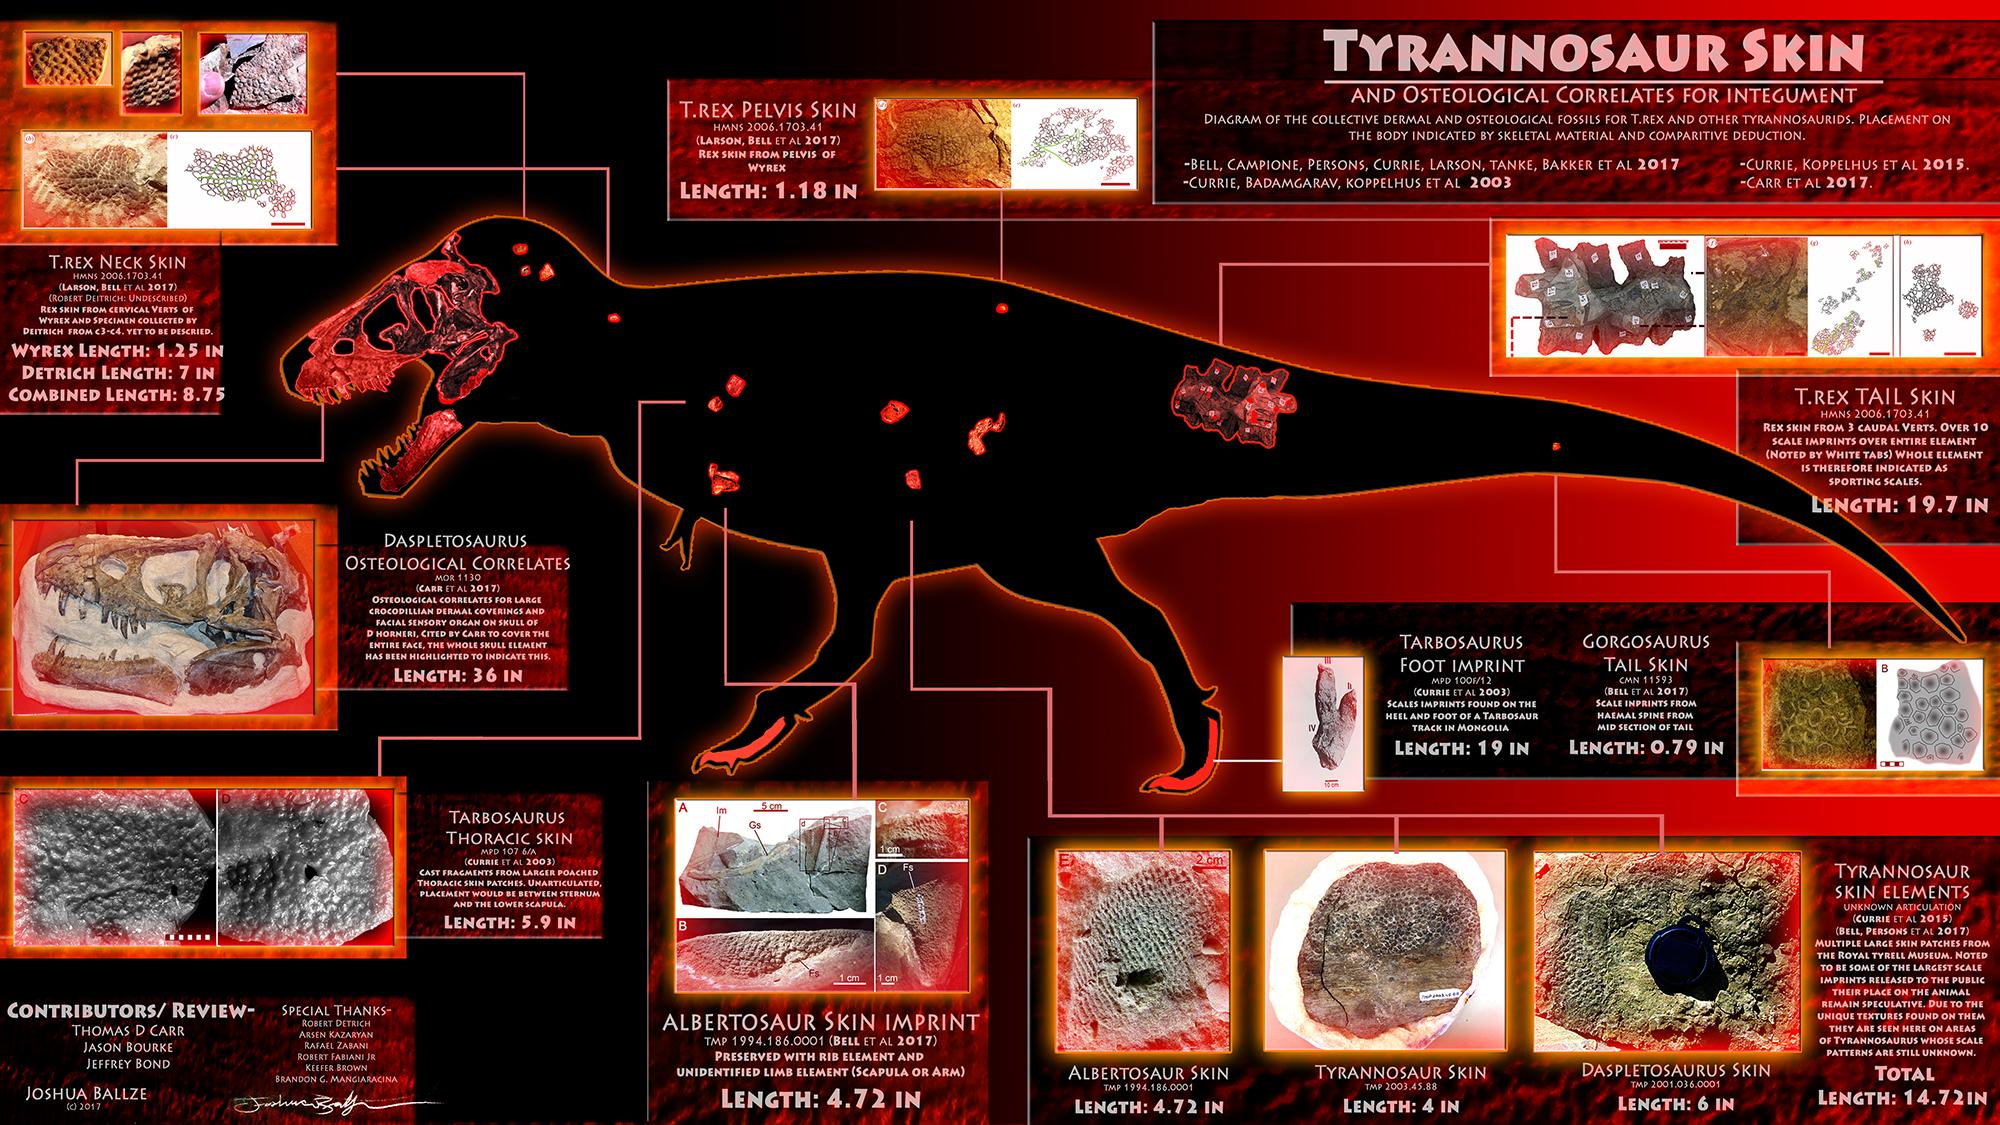 Tyrannosaur_skin_impressions-lite.jpg